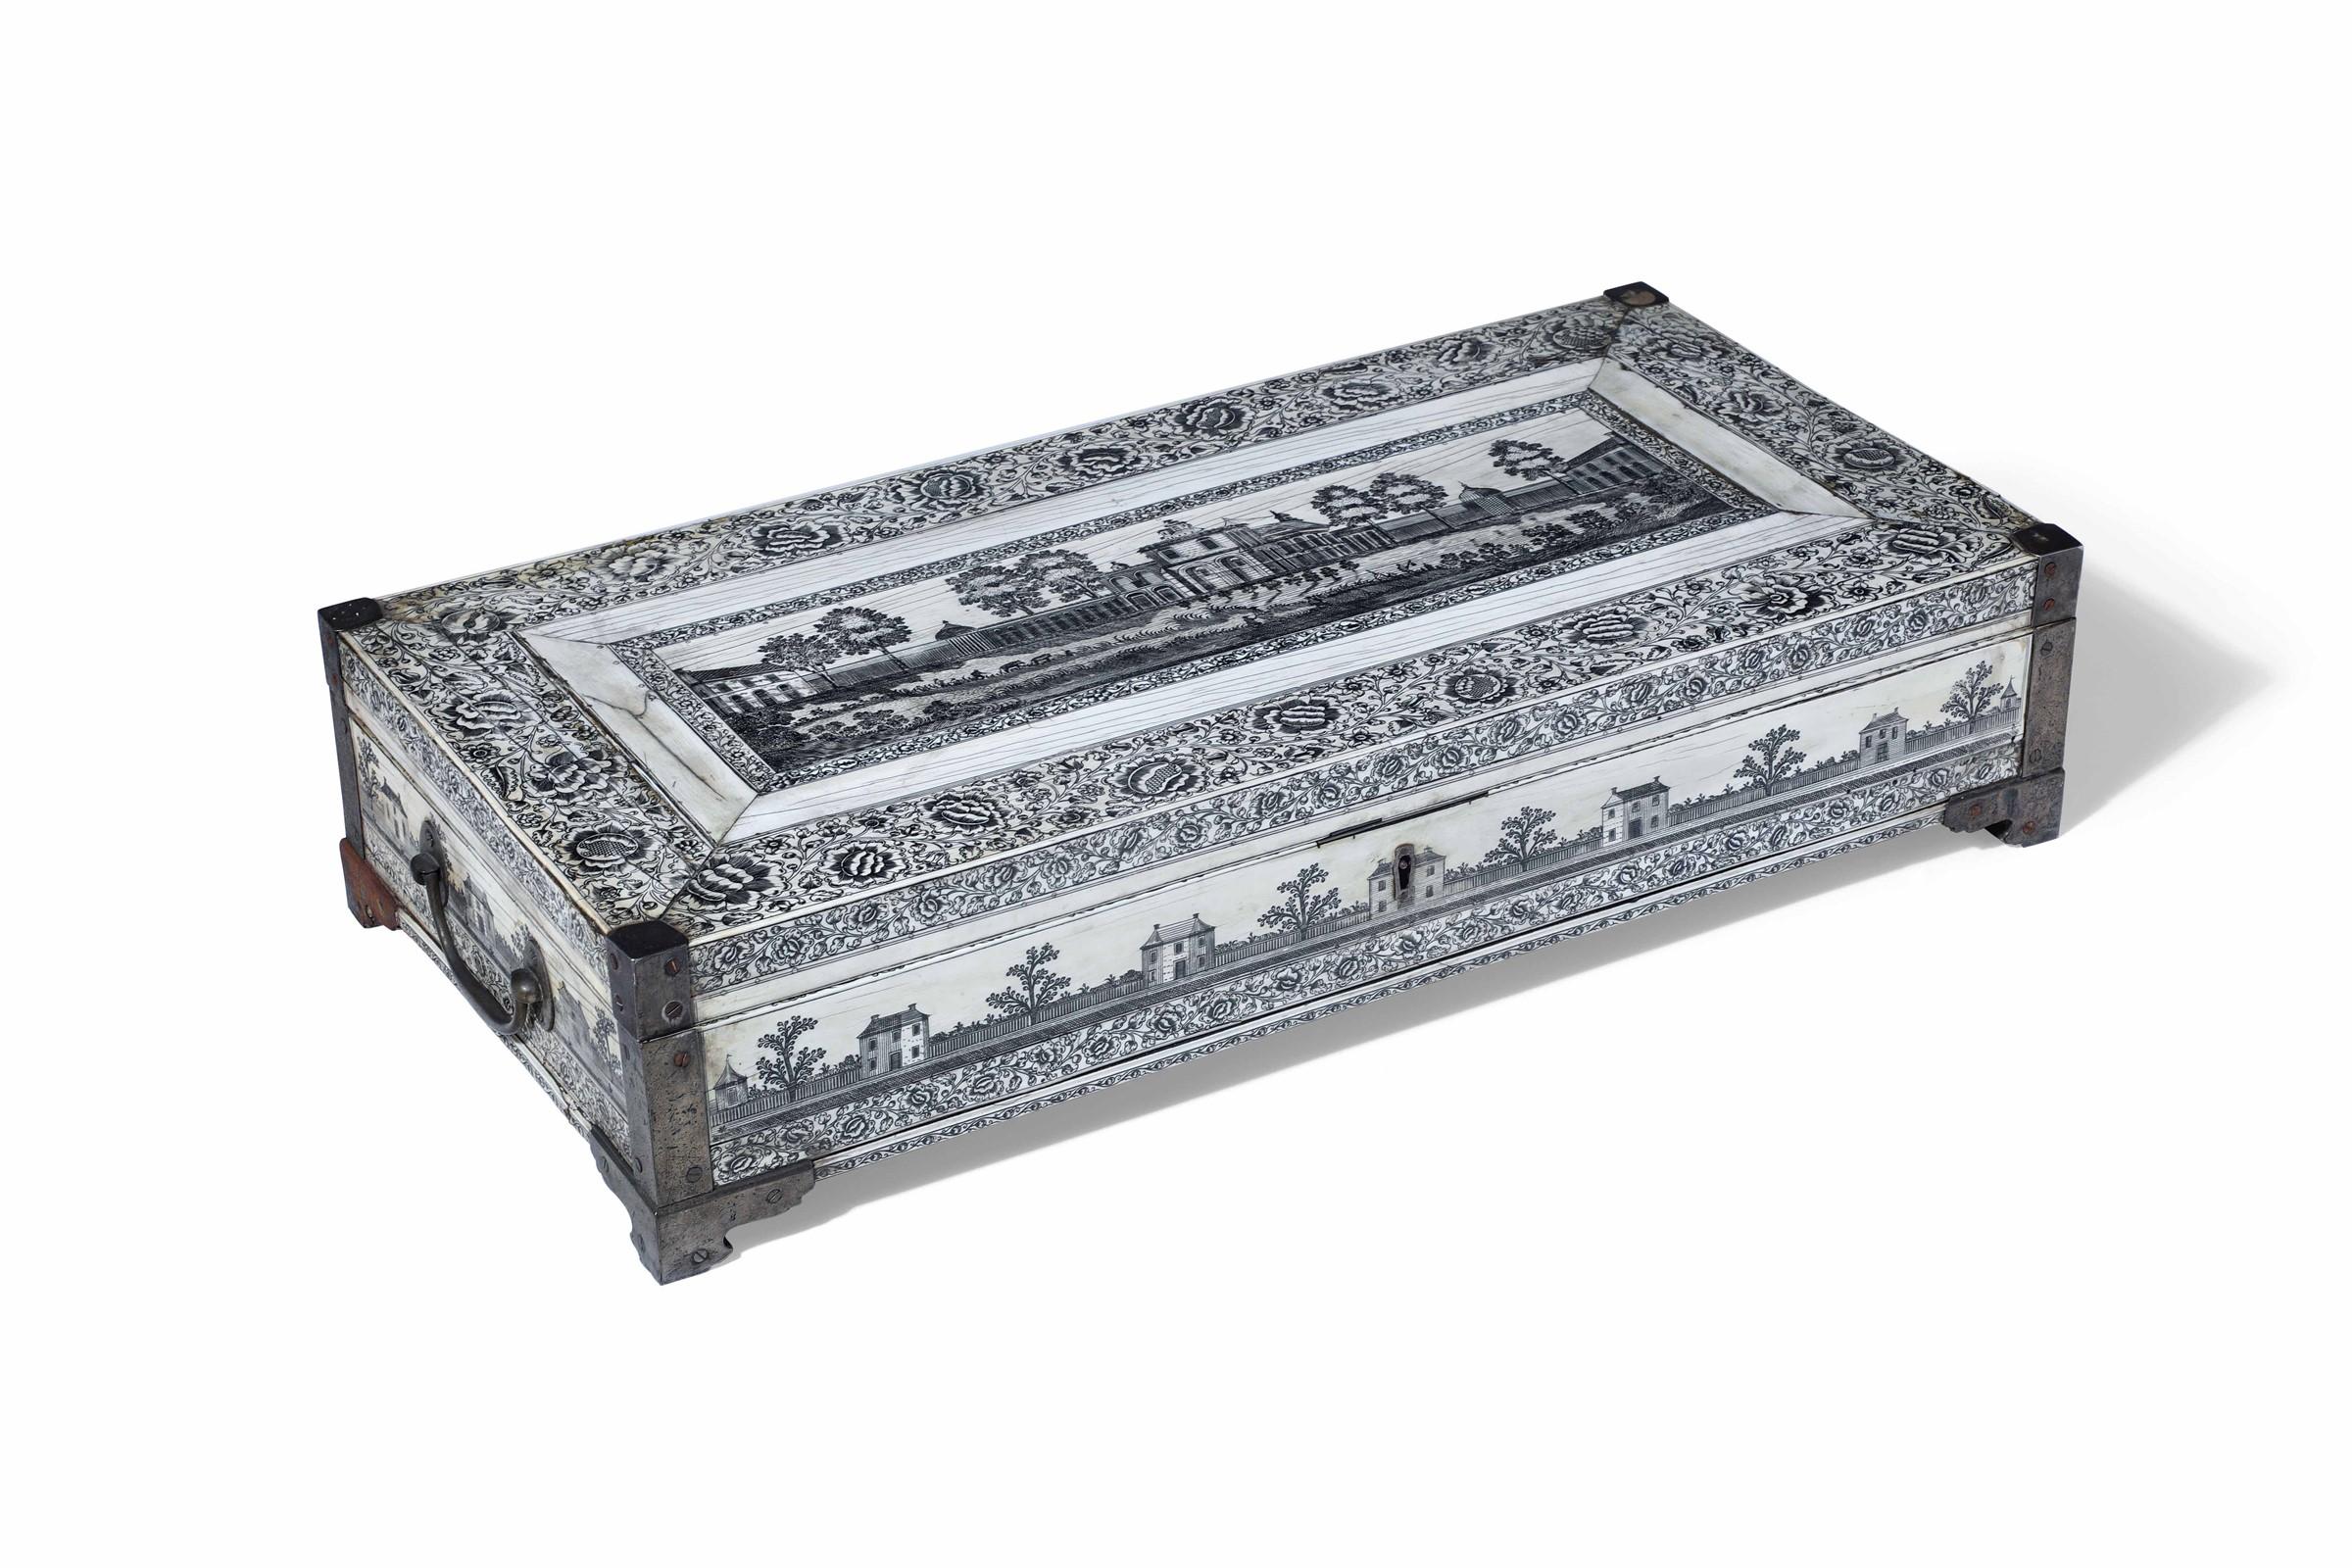 A writing box, Vizagapathan, India, 17/1800s - cm 61x30x14 Eleganti fasce decorate [...] - Image 2 of 2